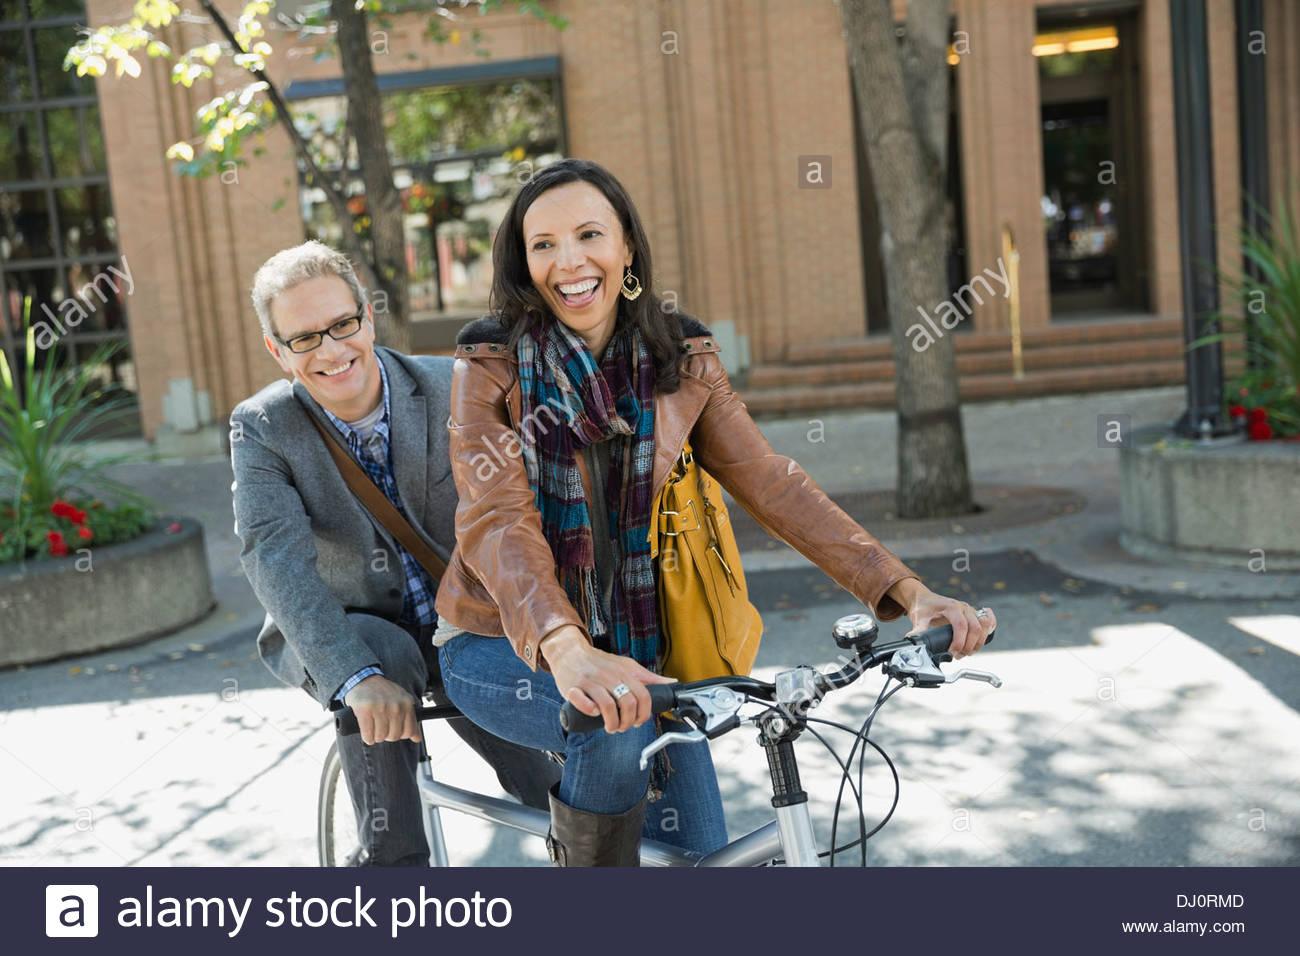 Pareja sonriente montando bicicleta tándem Imagen De Stock